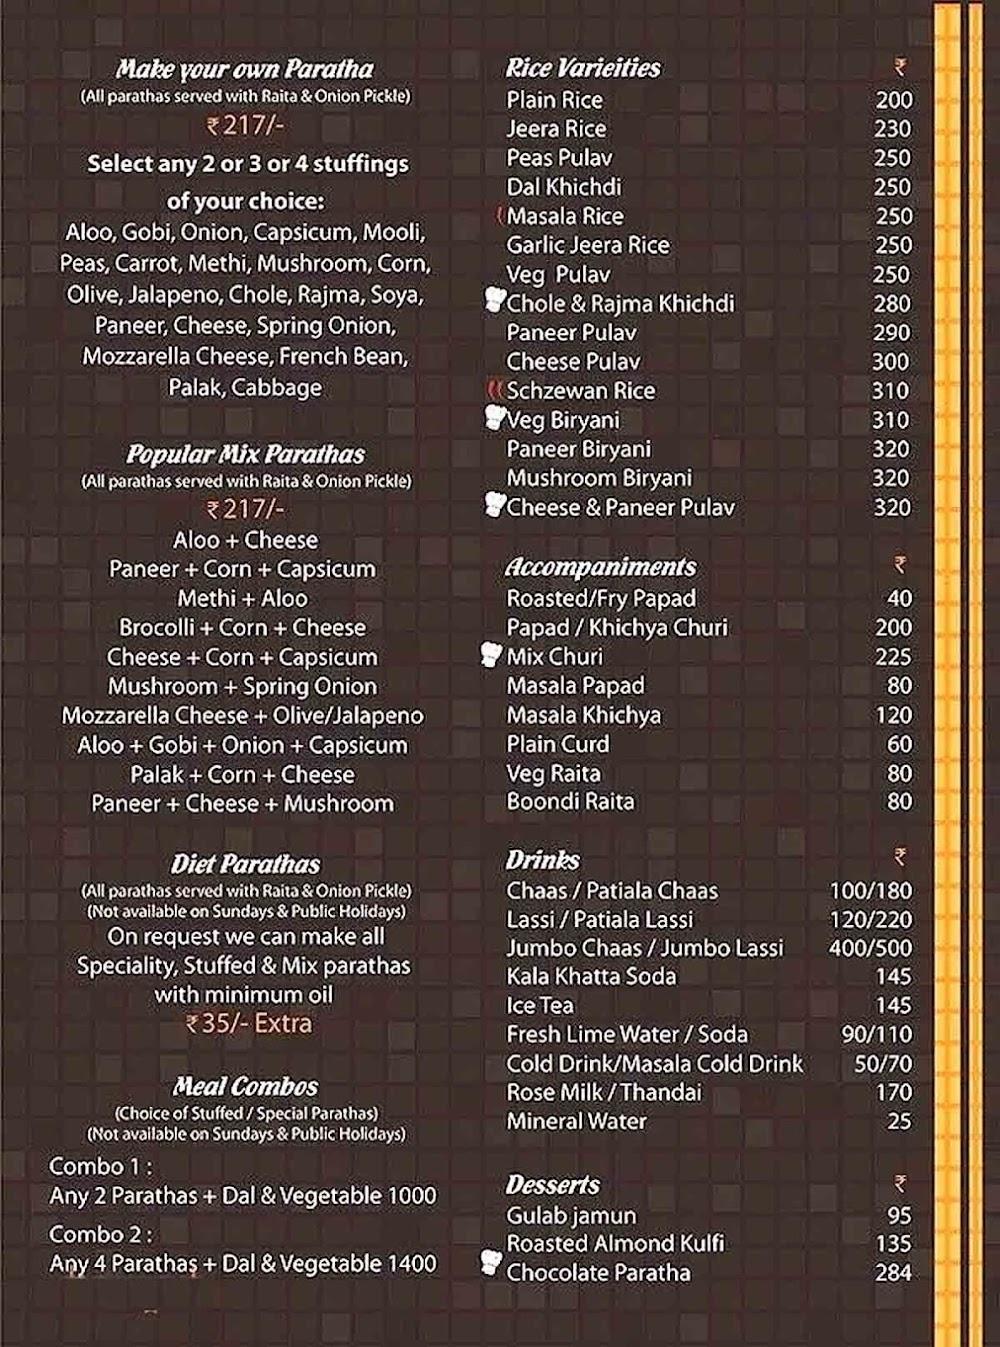 Paratha Mantra menu 2